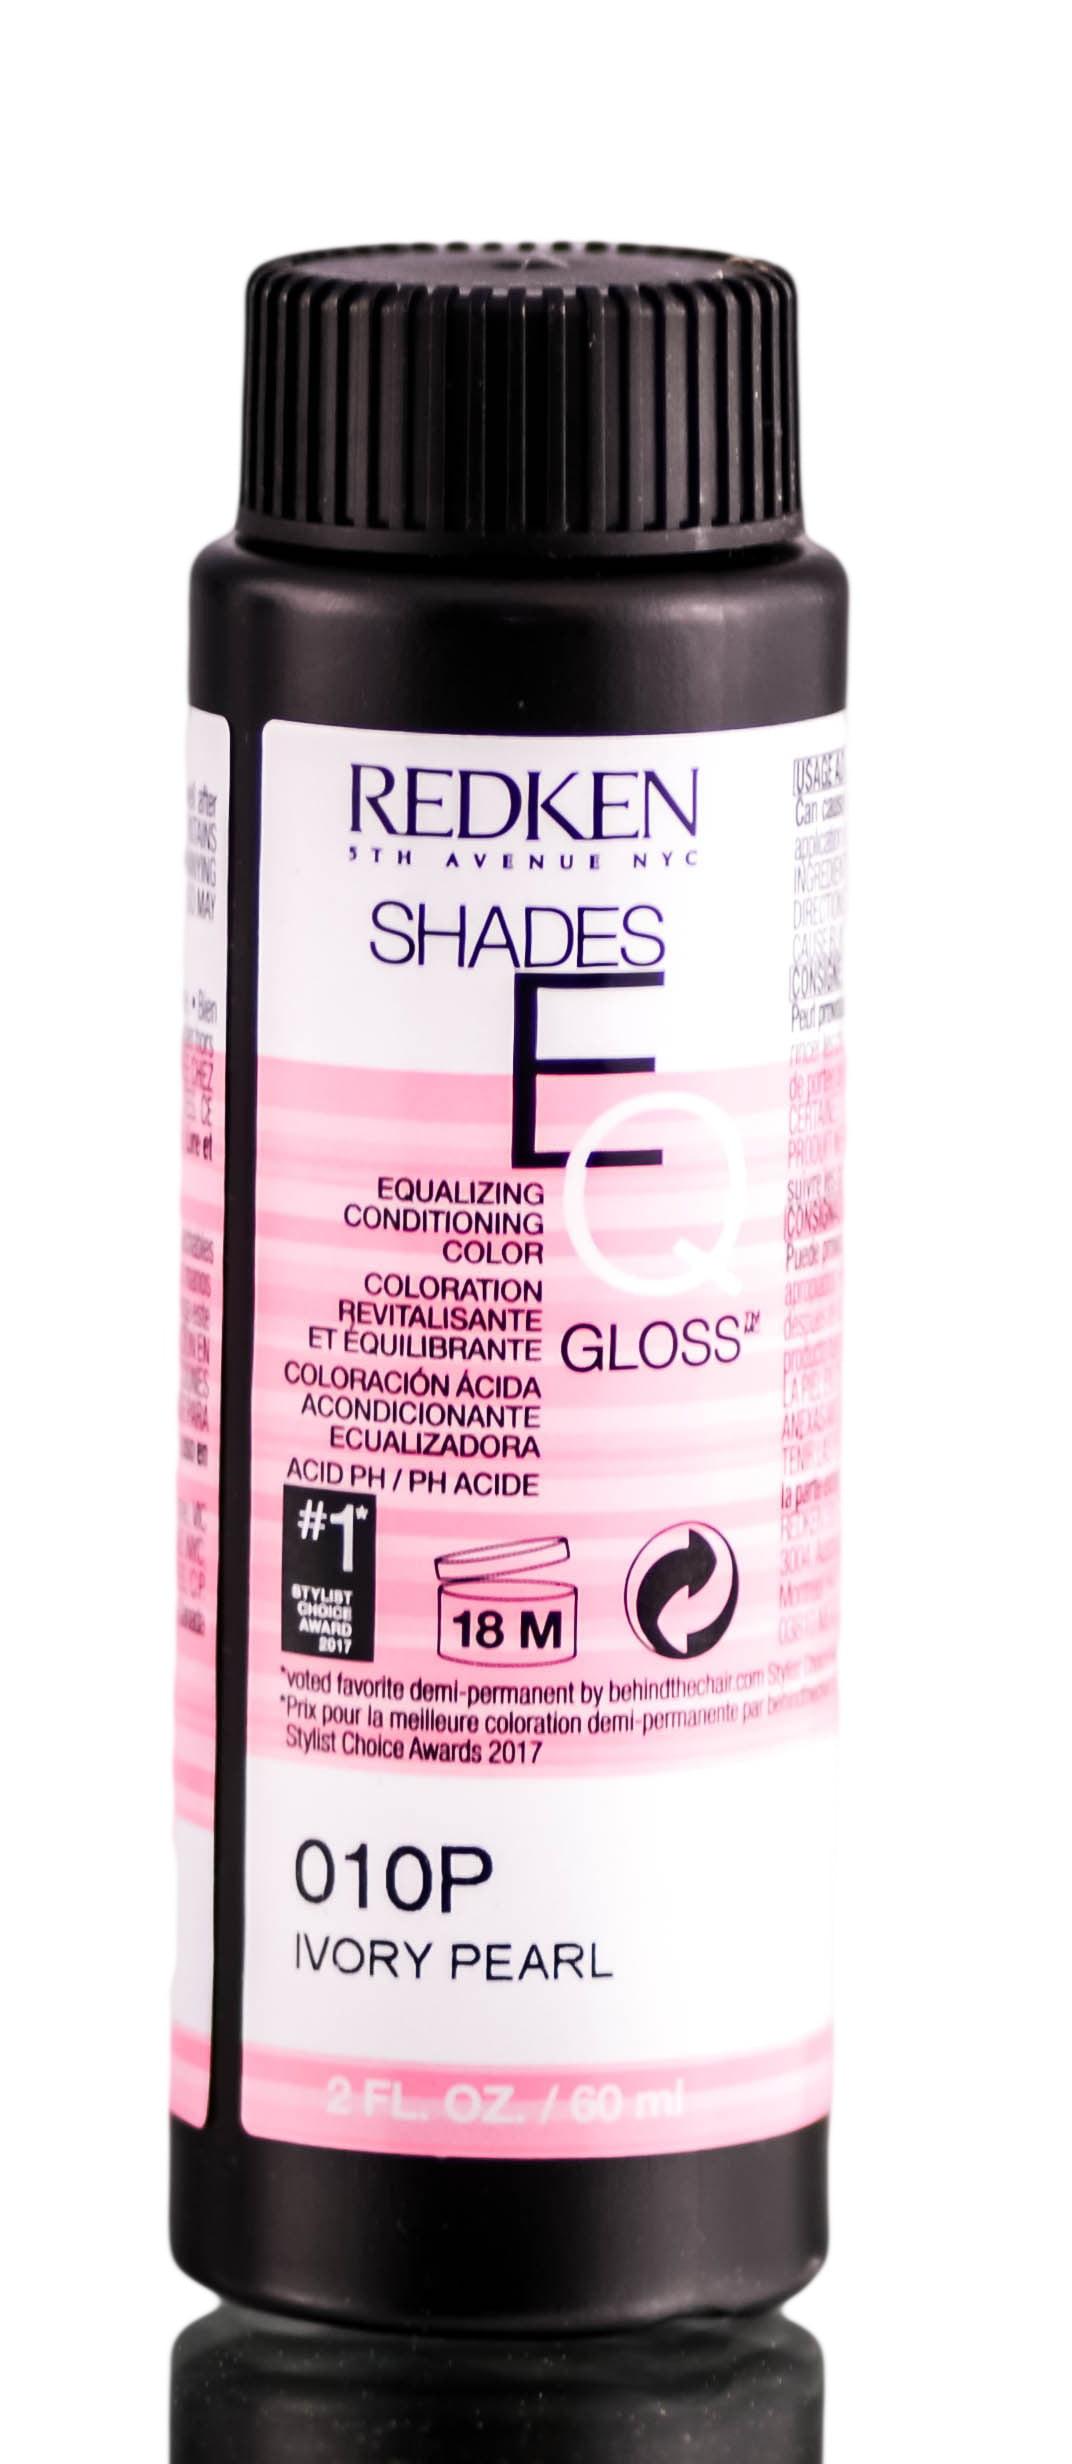 Redken Shades Eq Demi Permanent Equalizing Conditioning Color Gloss Ammonia Free 010p 10p Ivory Pearl Walmart Com Walmart Com